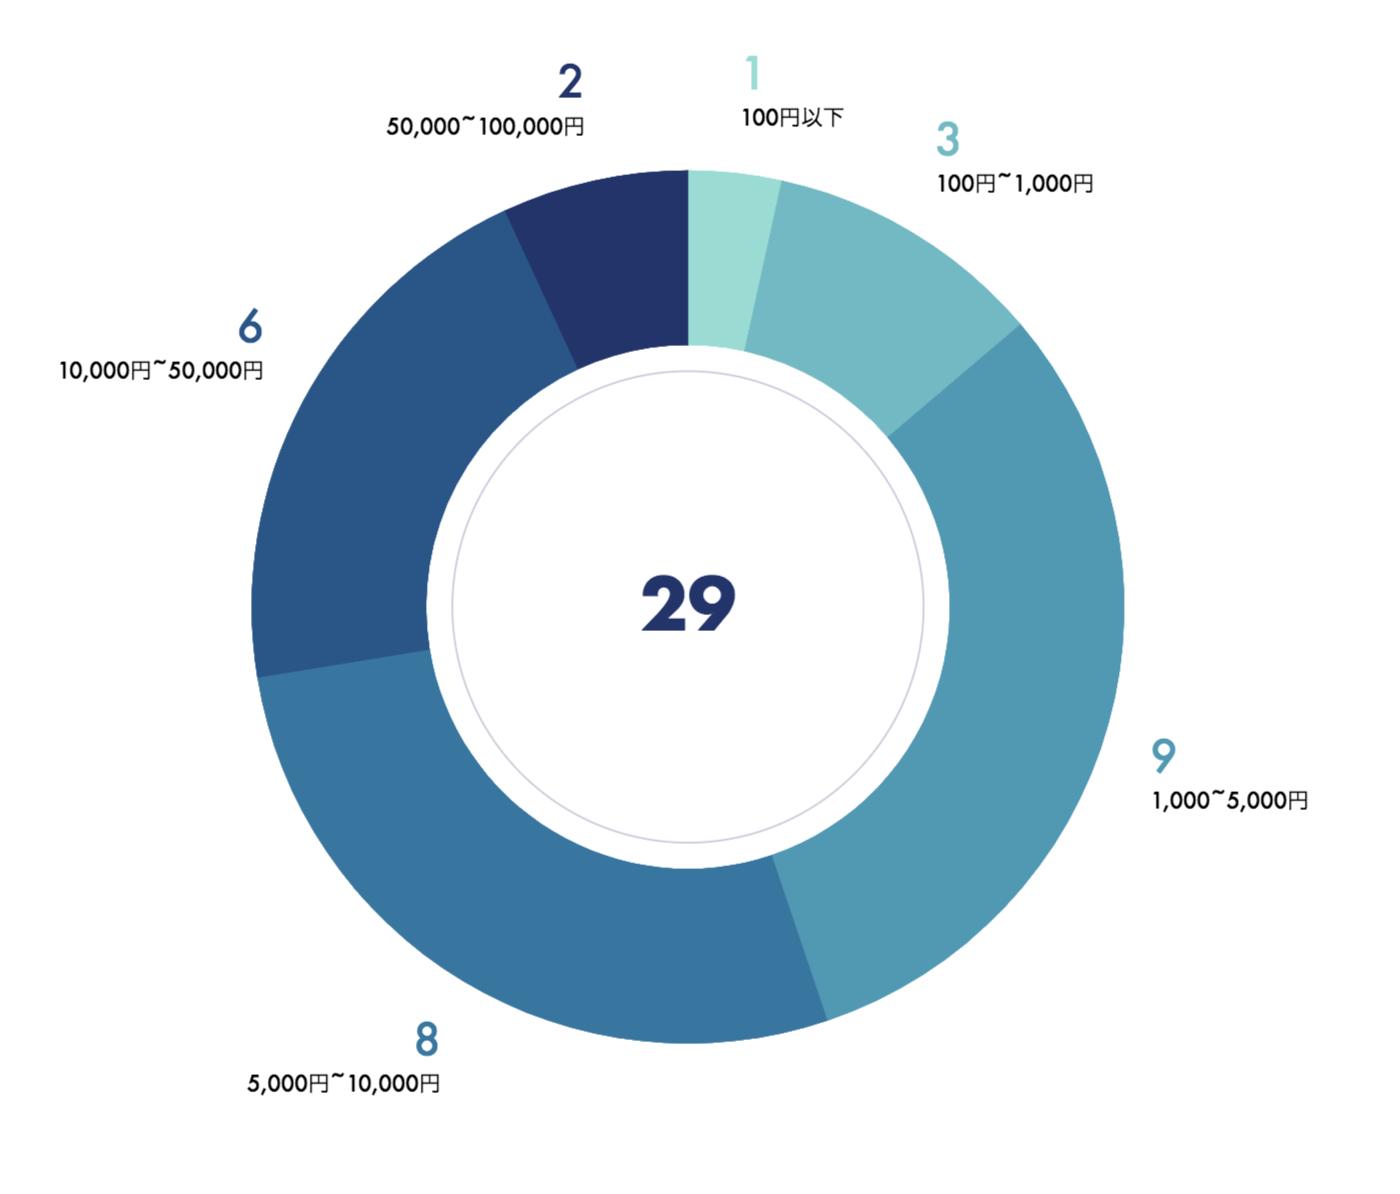 LOB第1回ベッターズアンケート結果(平均賭け金額)